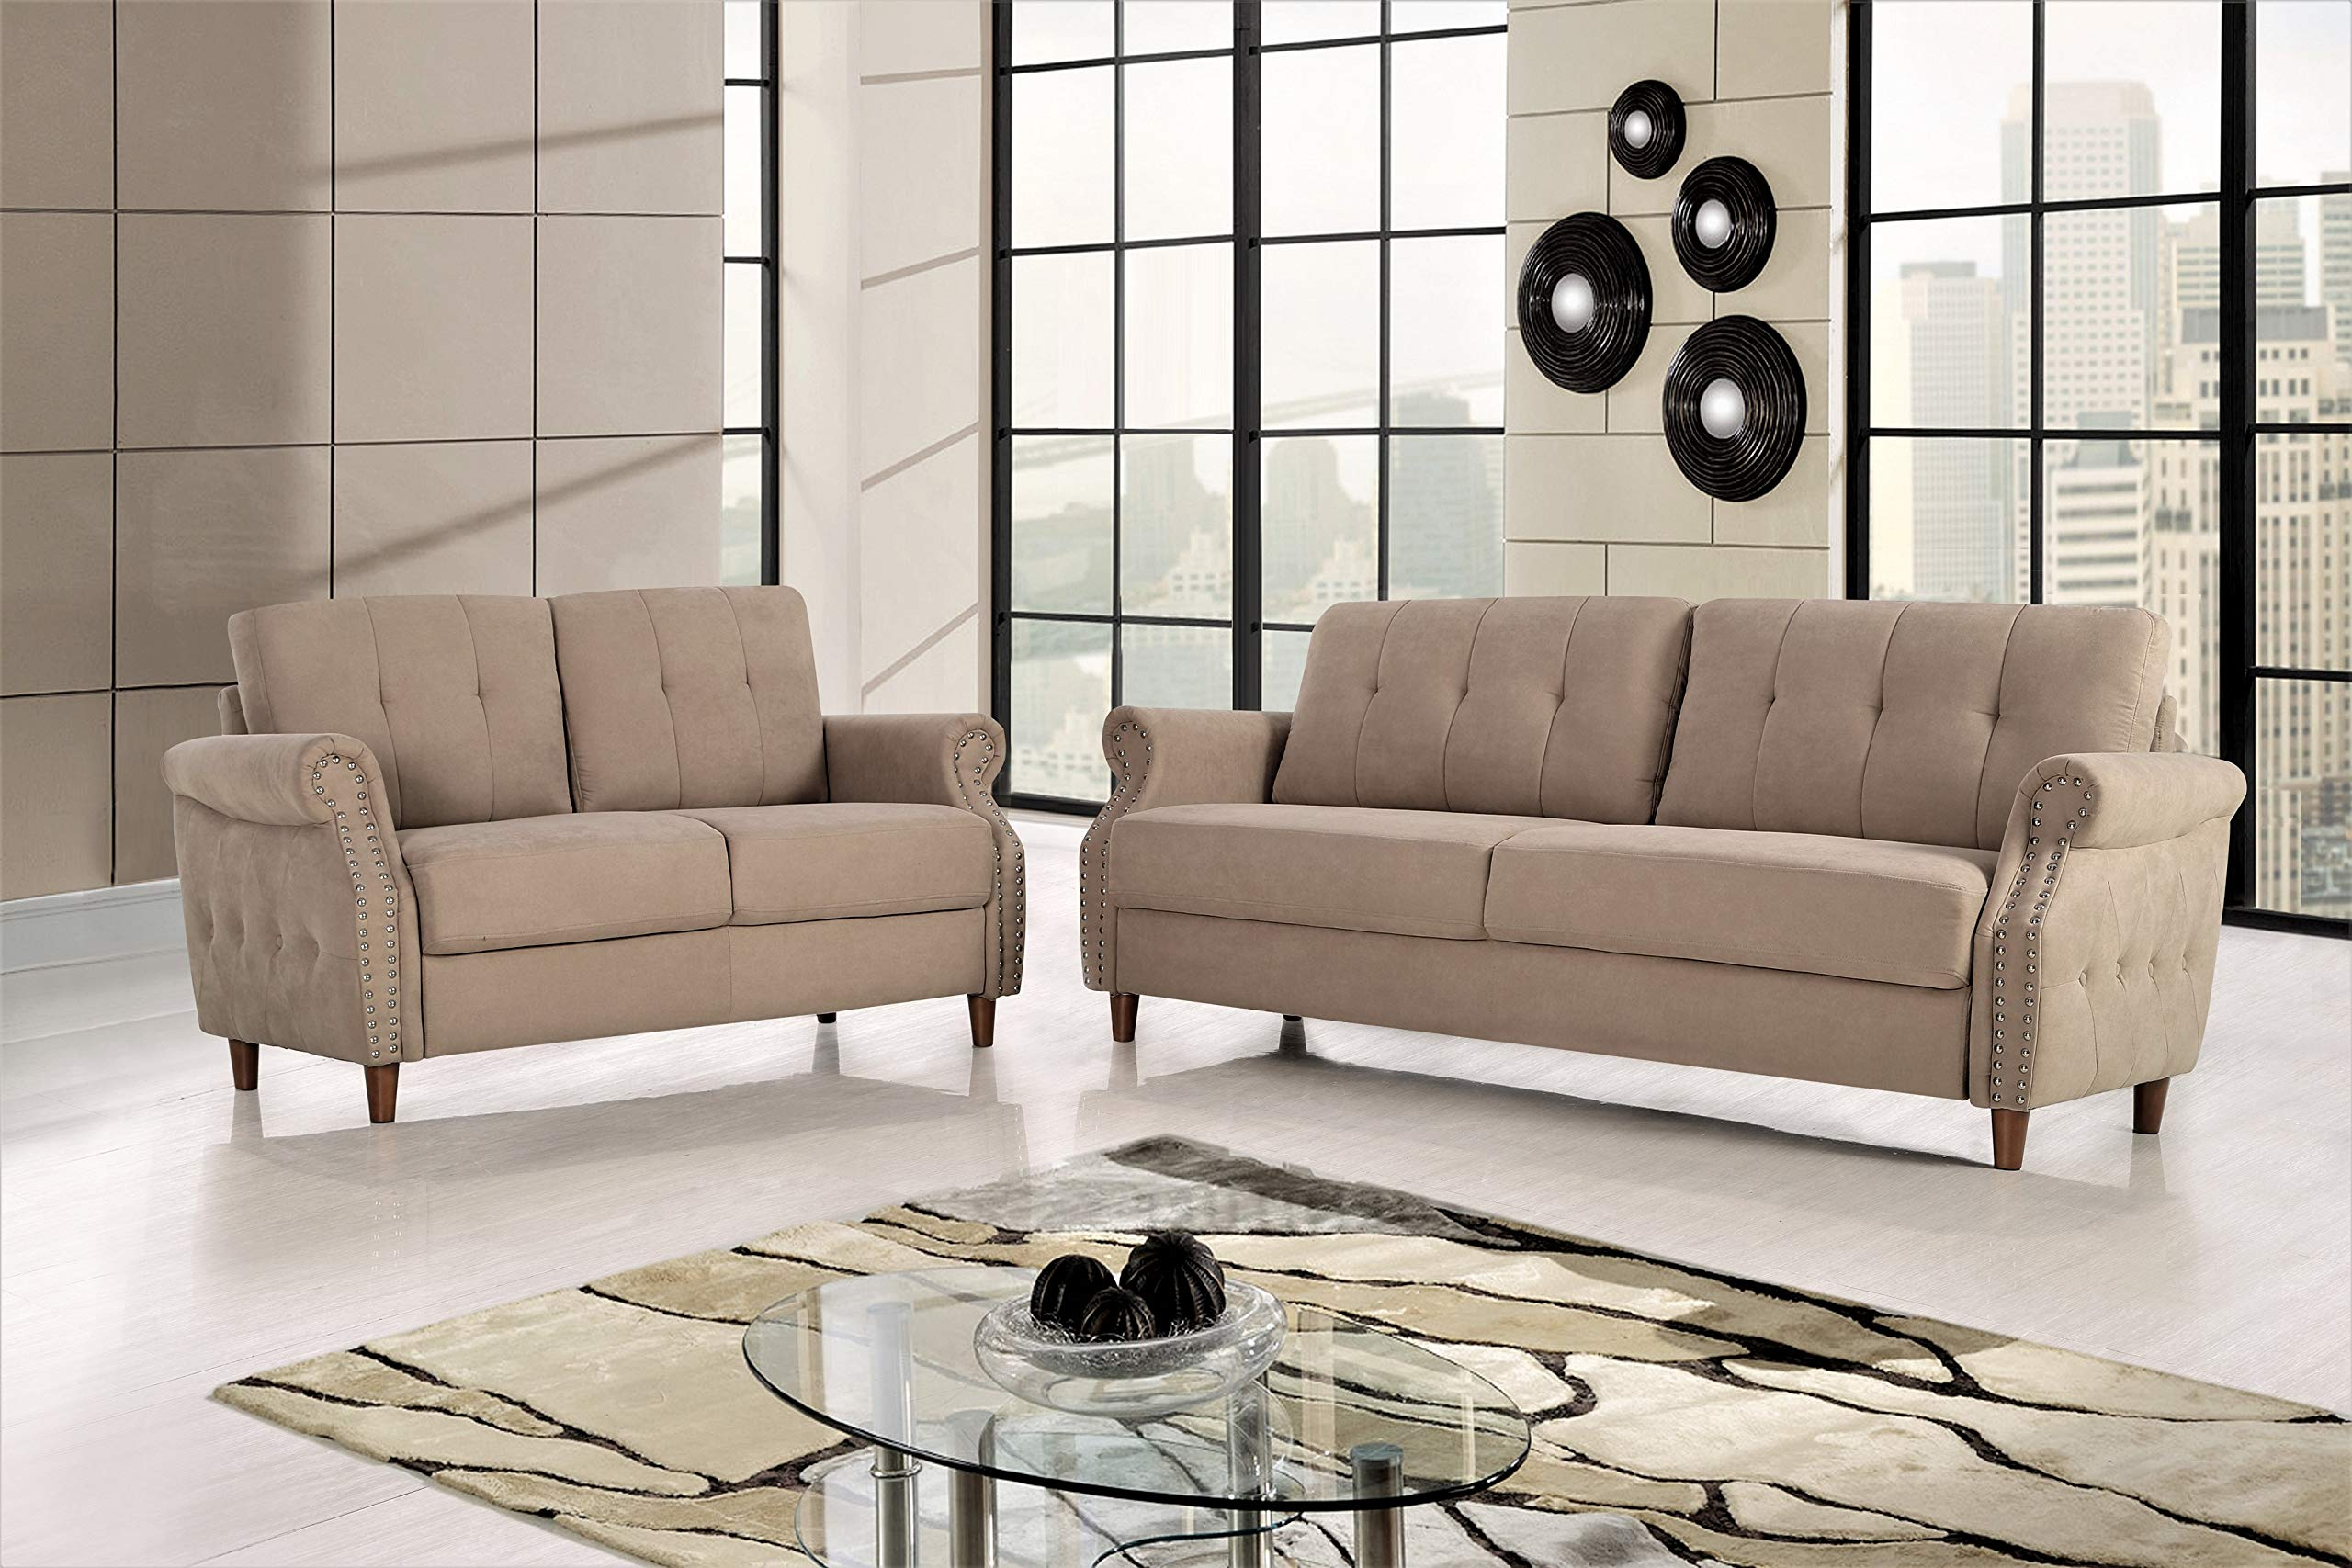 US Pride Furniture Living room set, Sofa and Loveseat, Camel by US Pride Furniture